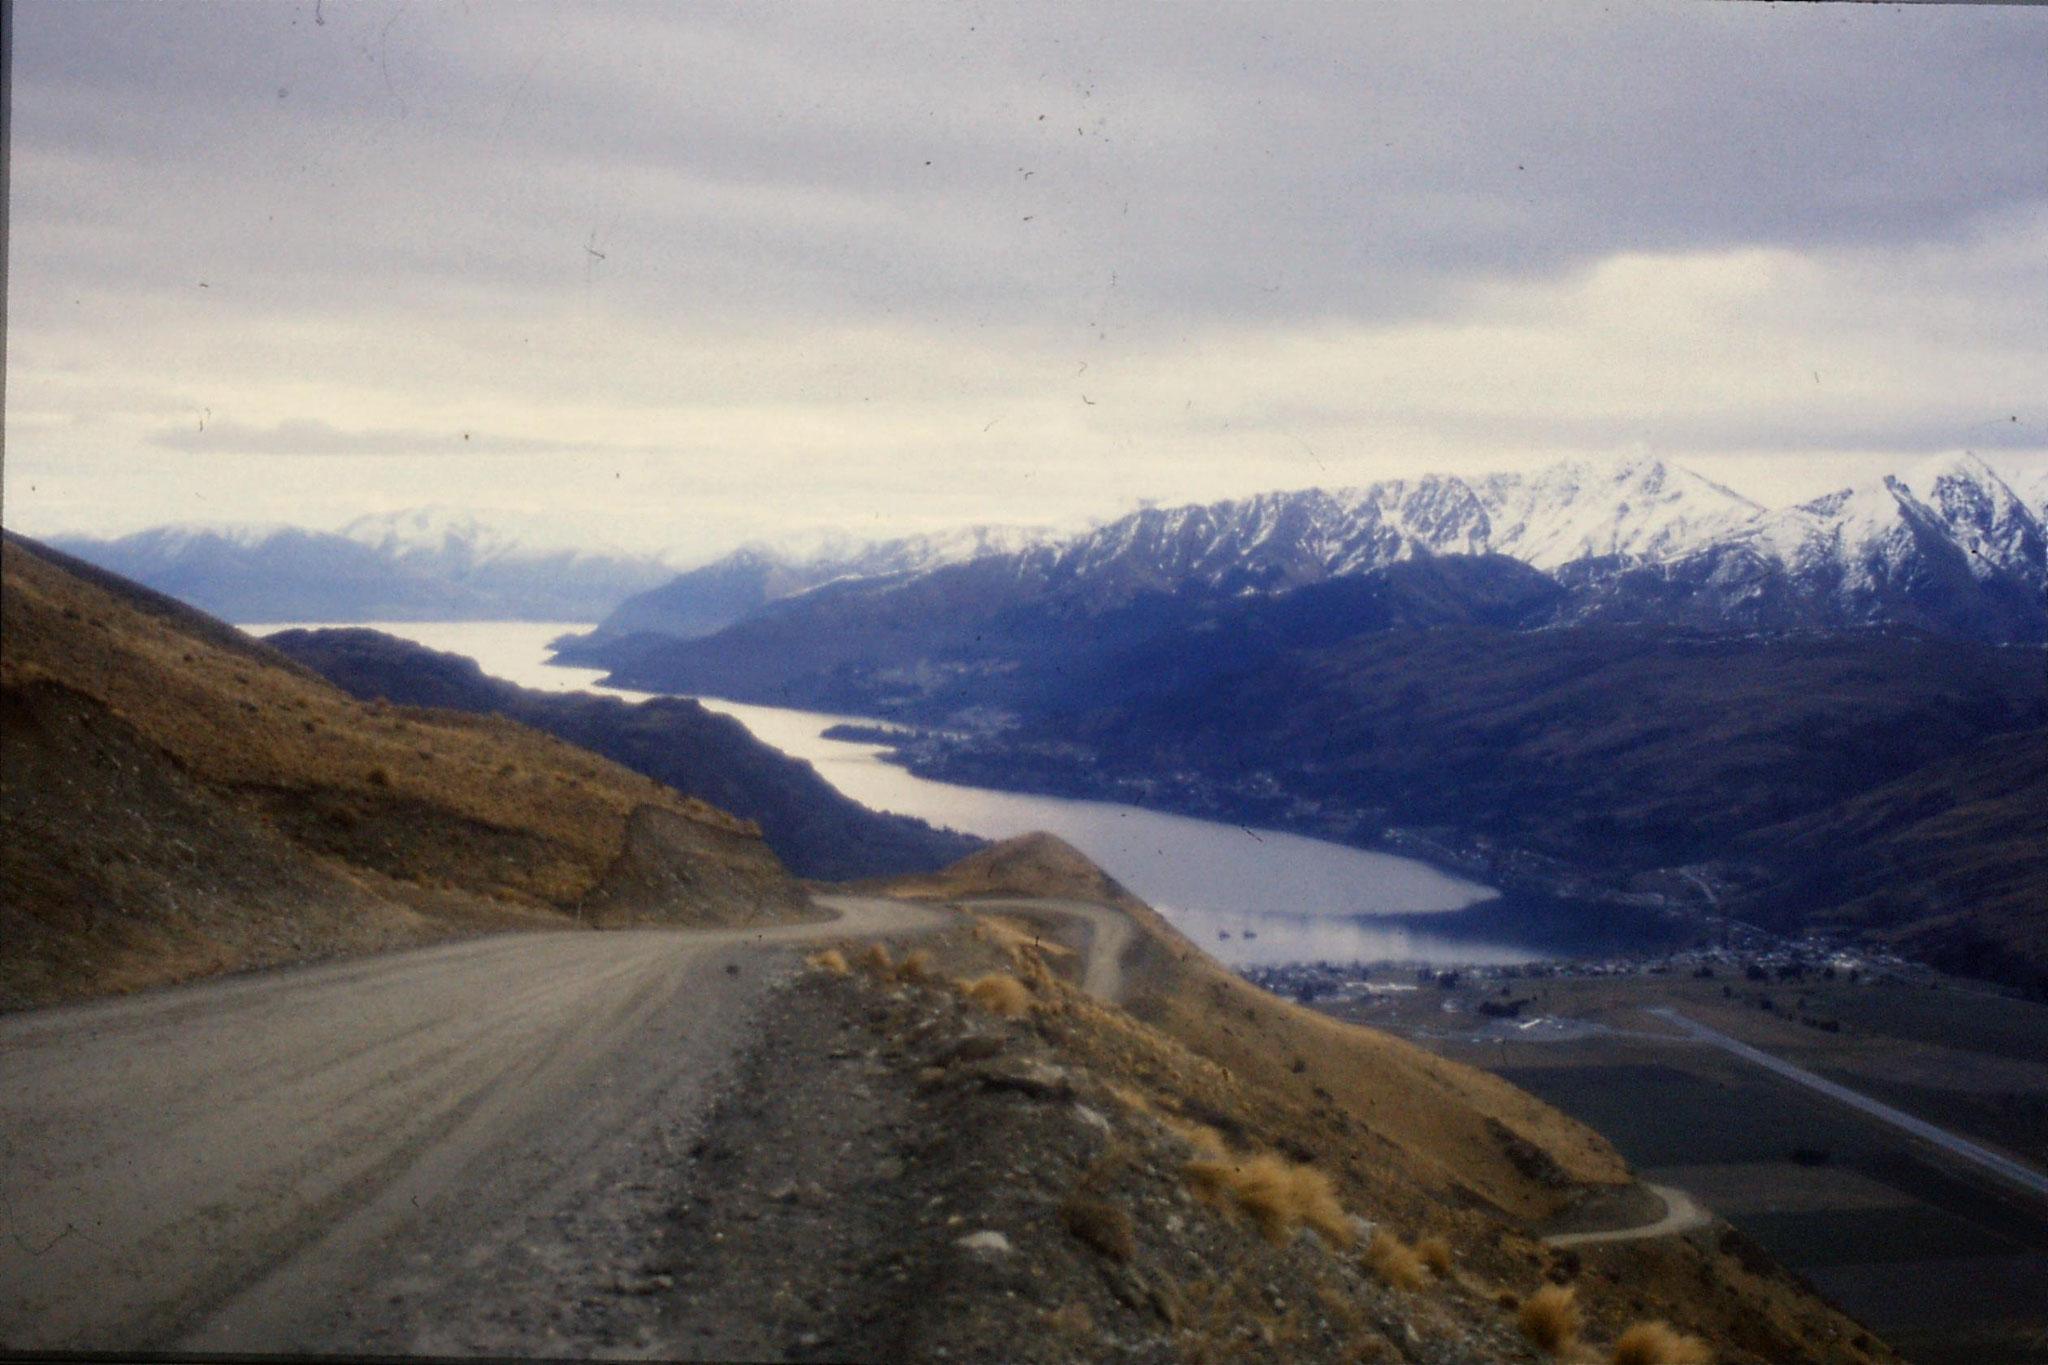 12/8/1990: 28: view of Lake Wakatipu and Queenstown